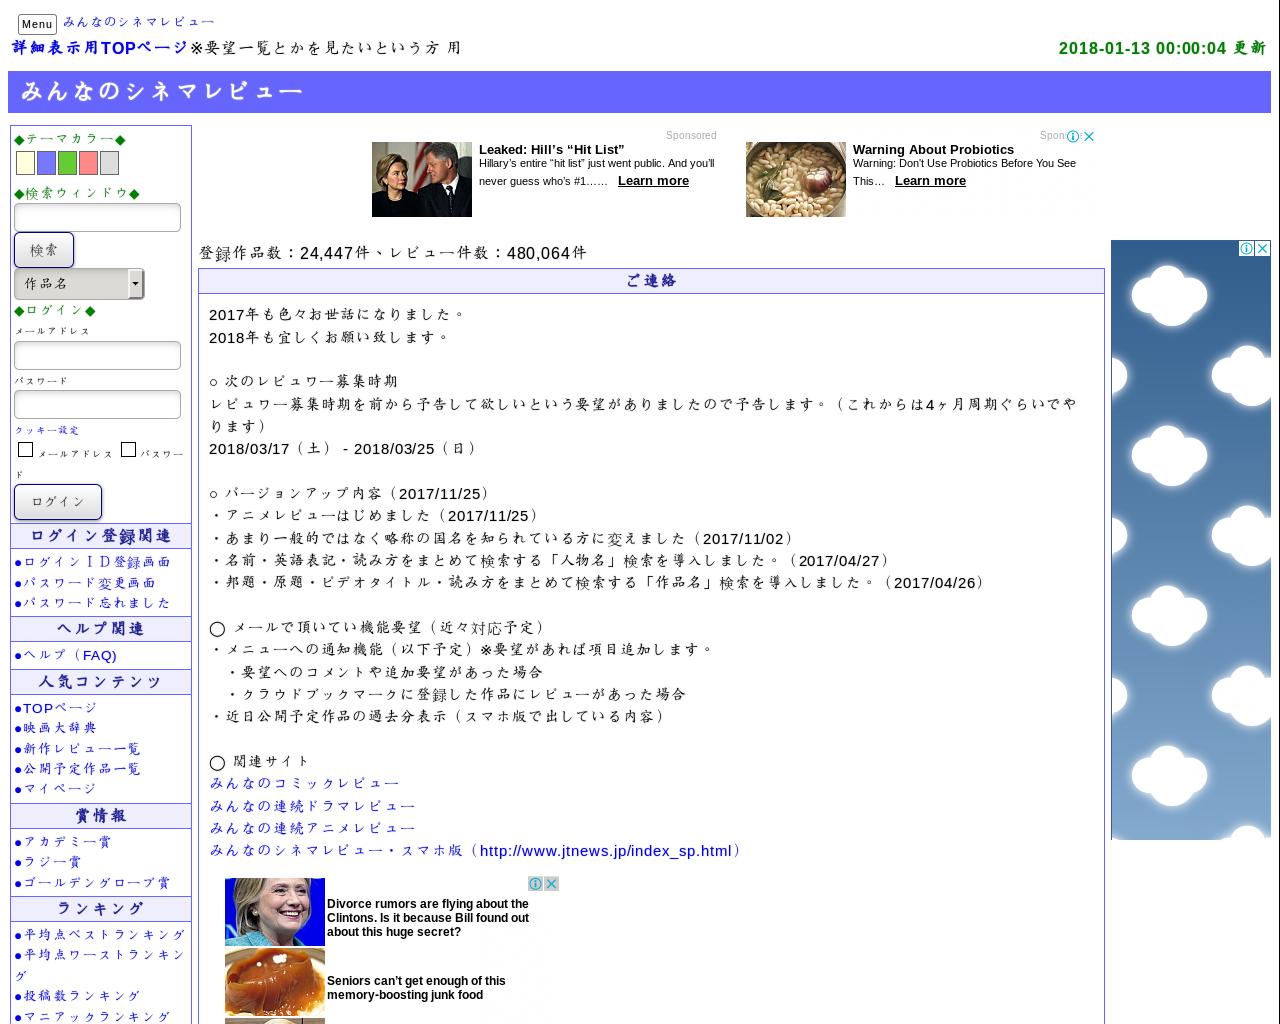 www.jtnews.jp(2018/01/13 00:12:38)